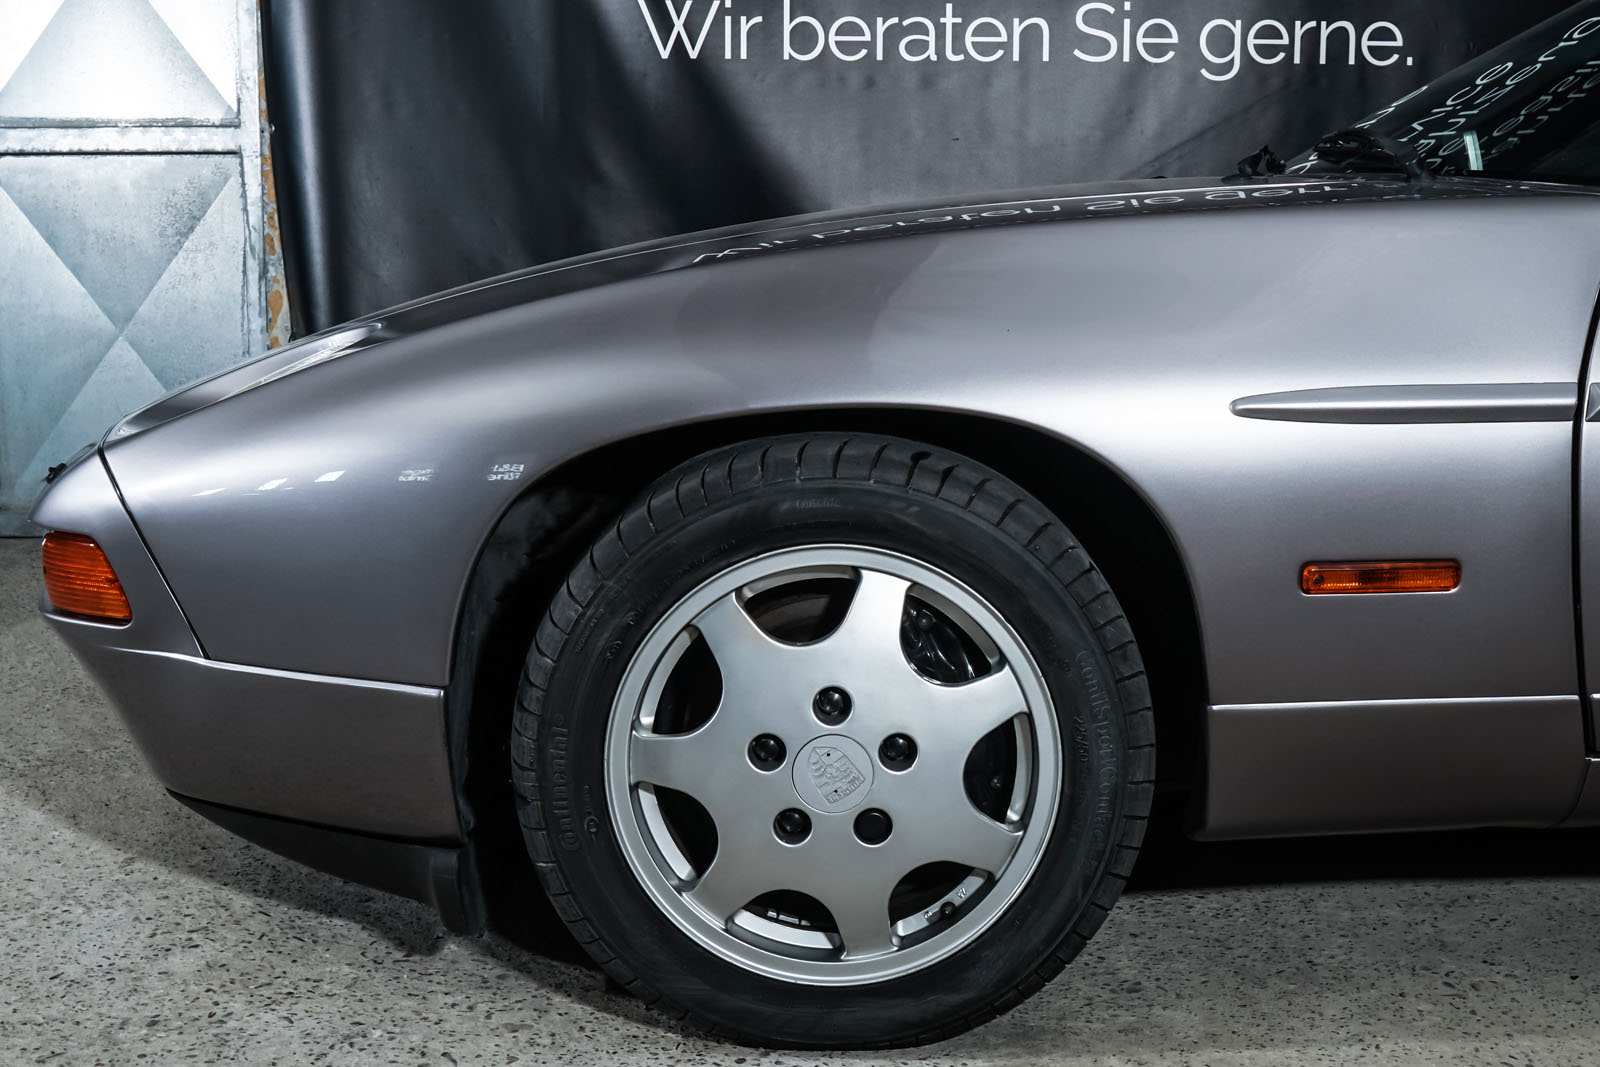 Porsche_928_Grau_Schwarz_POR-0325_3_w